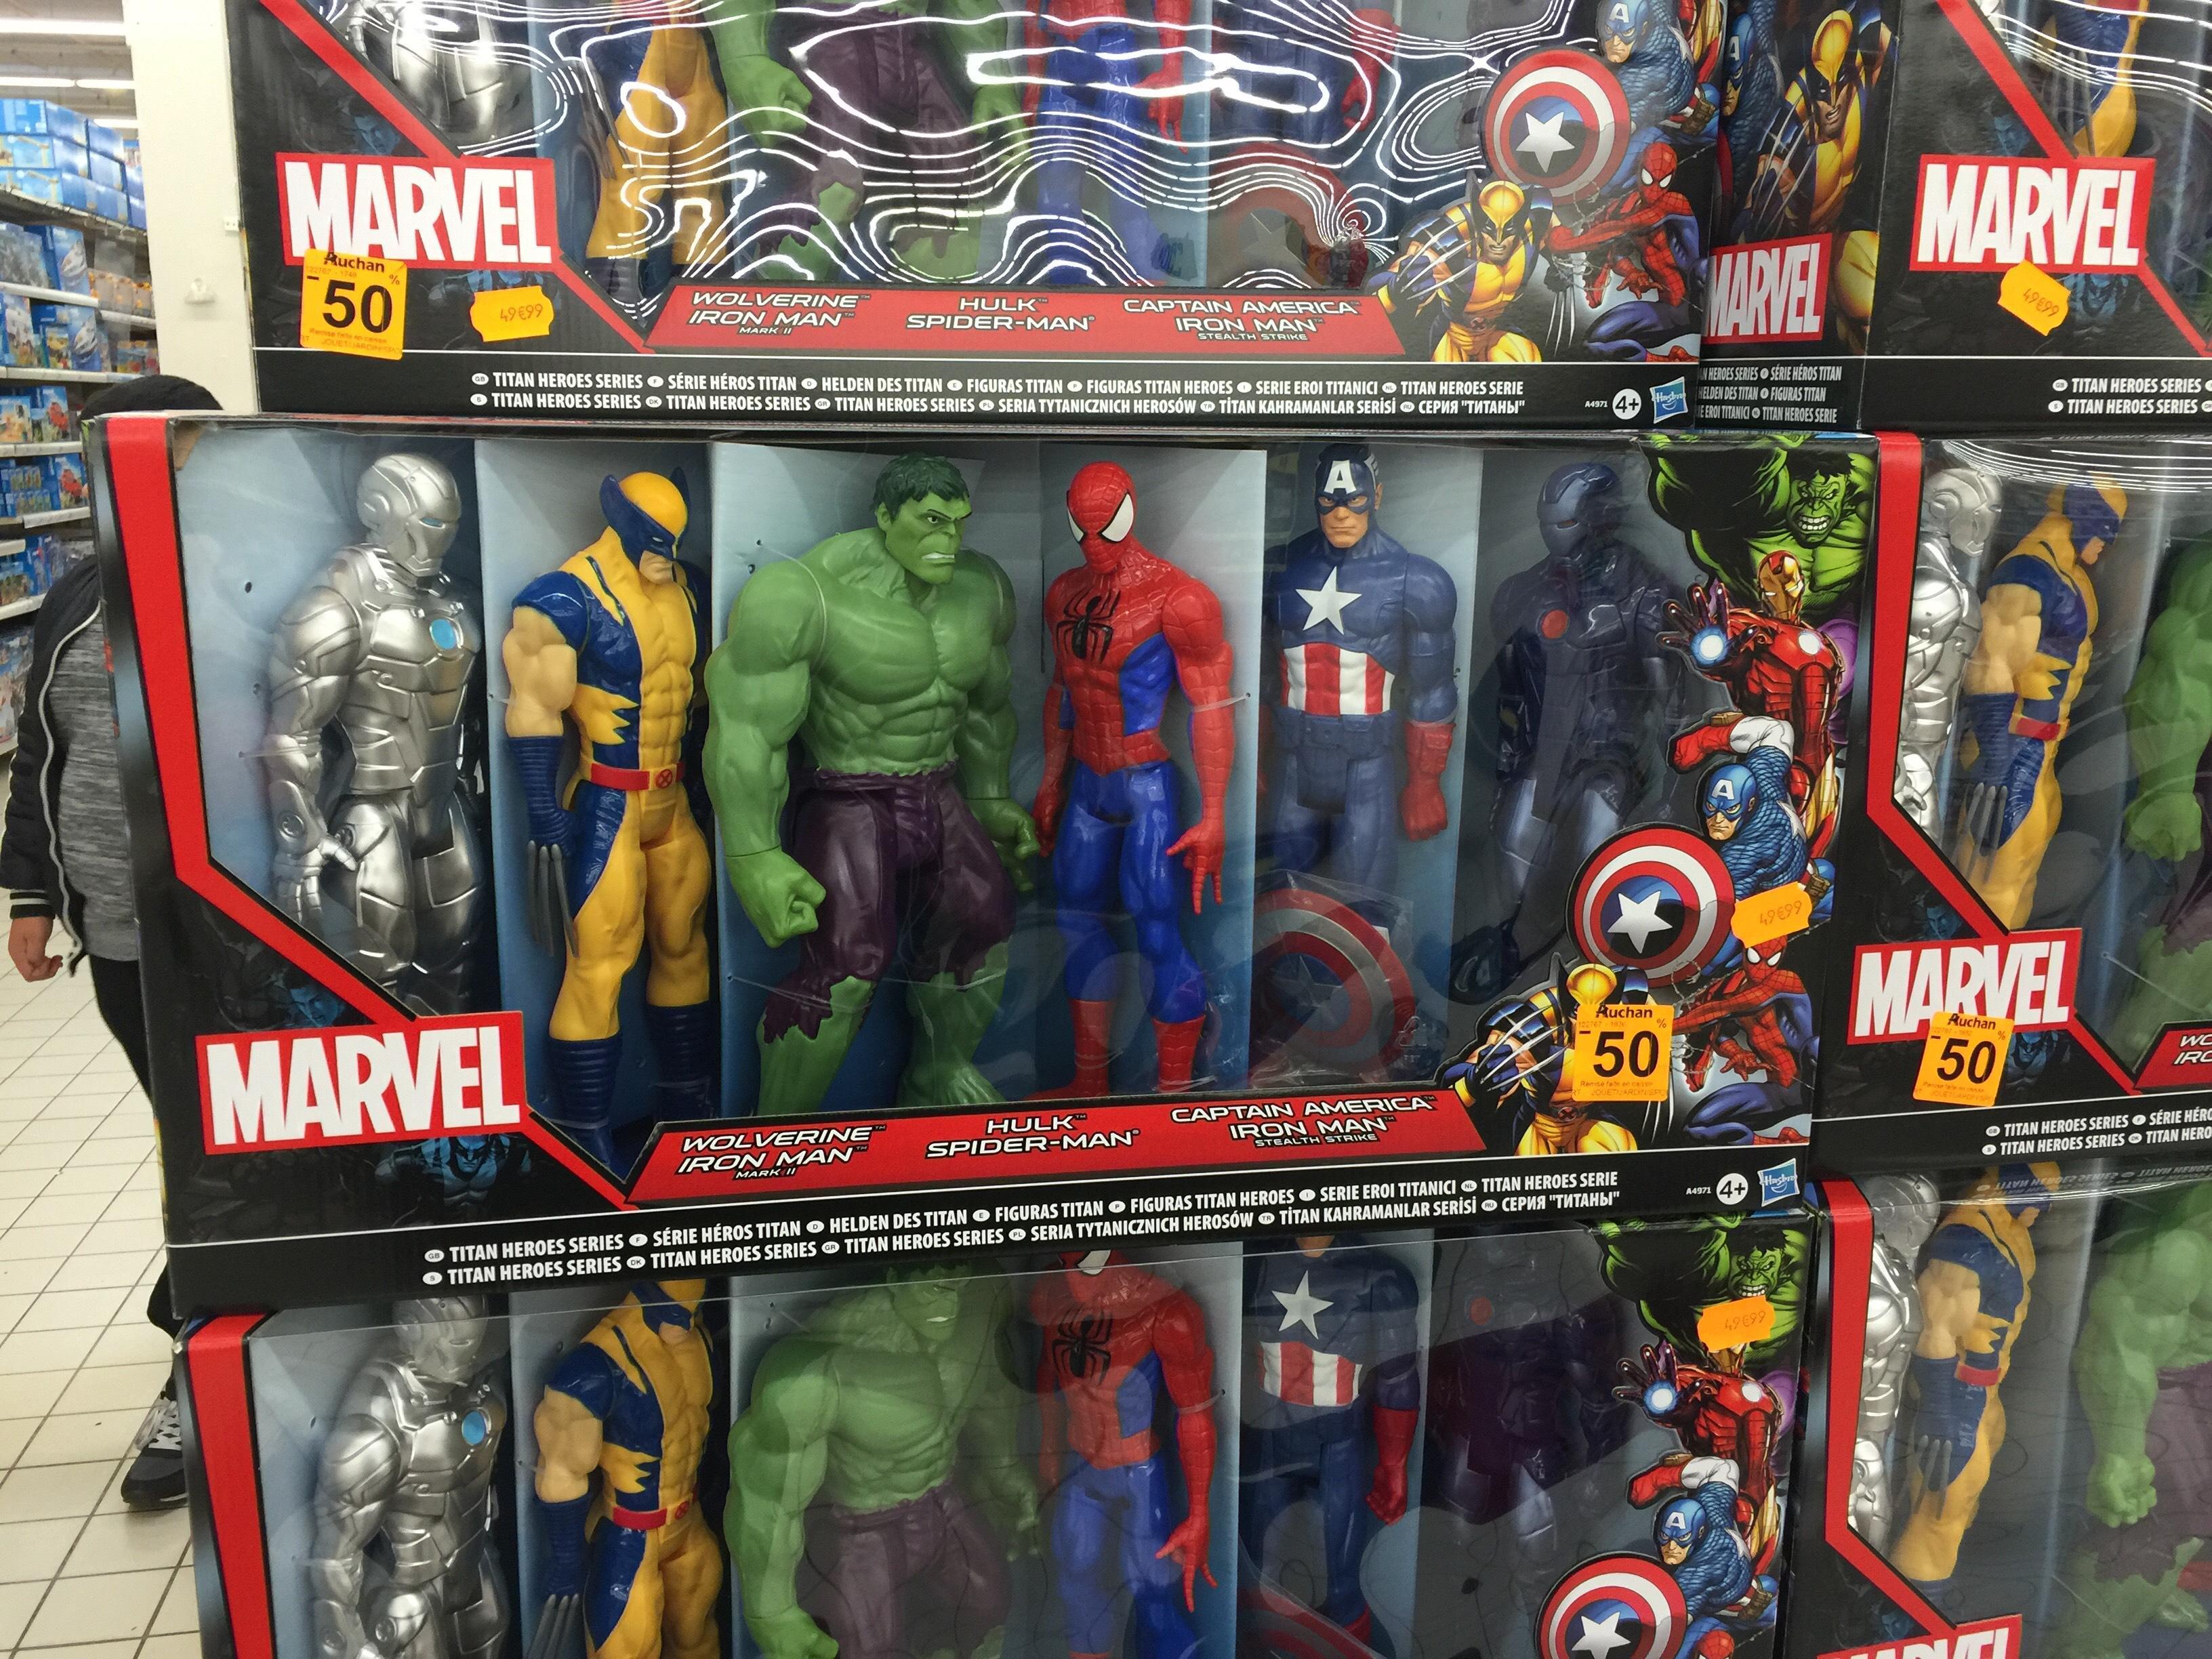 Coffret de 6 figurines Marvel 30 cm